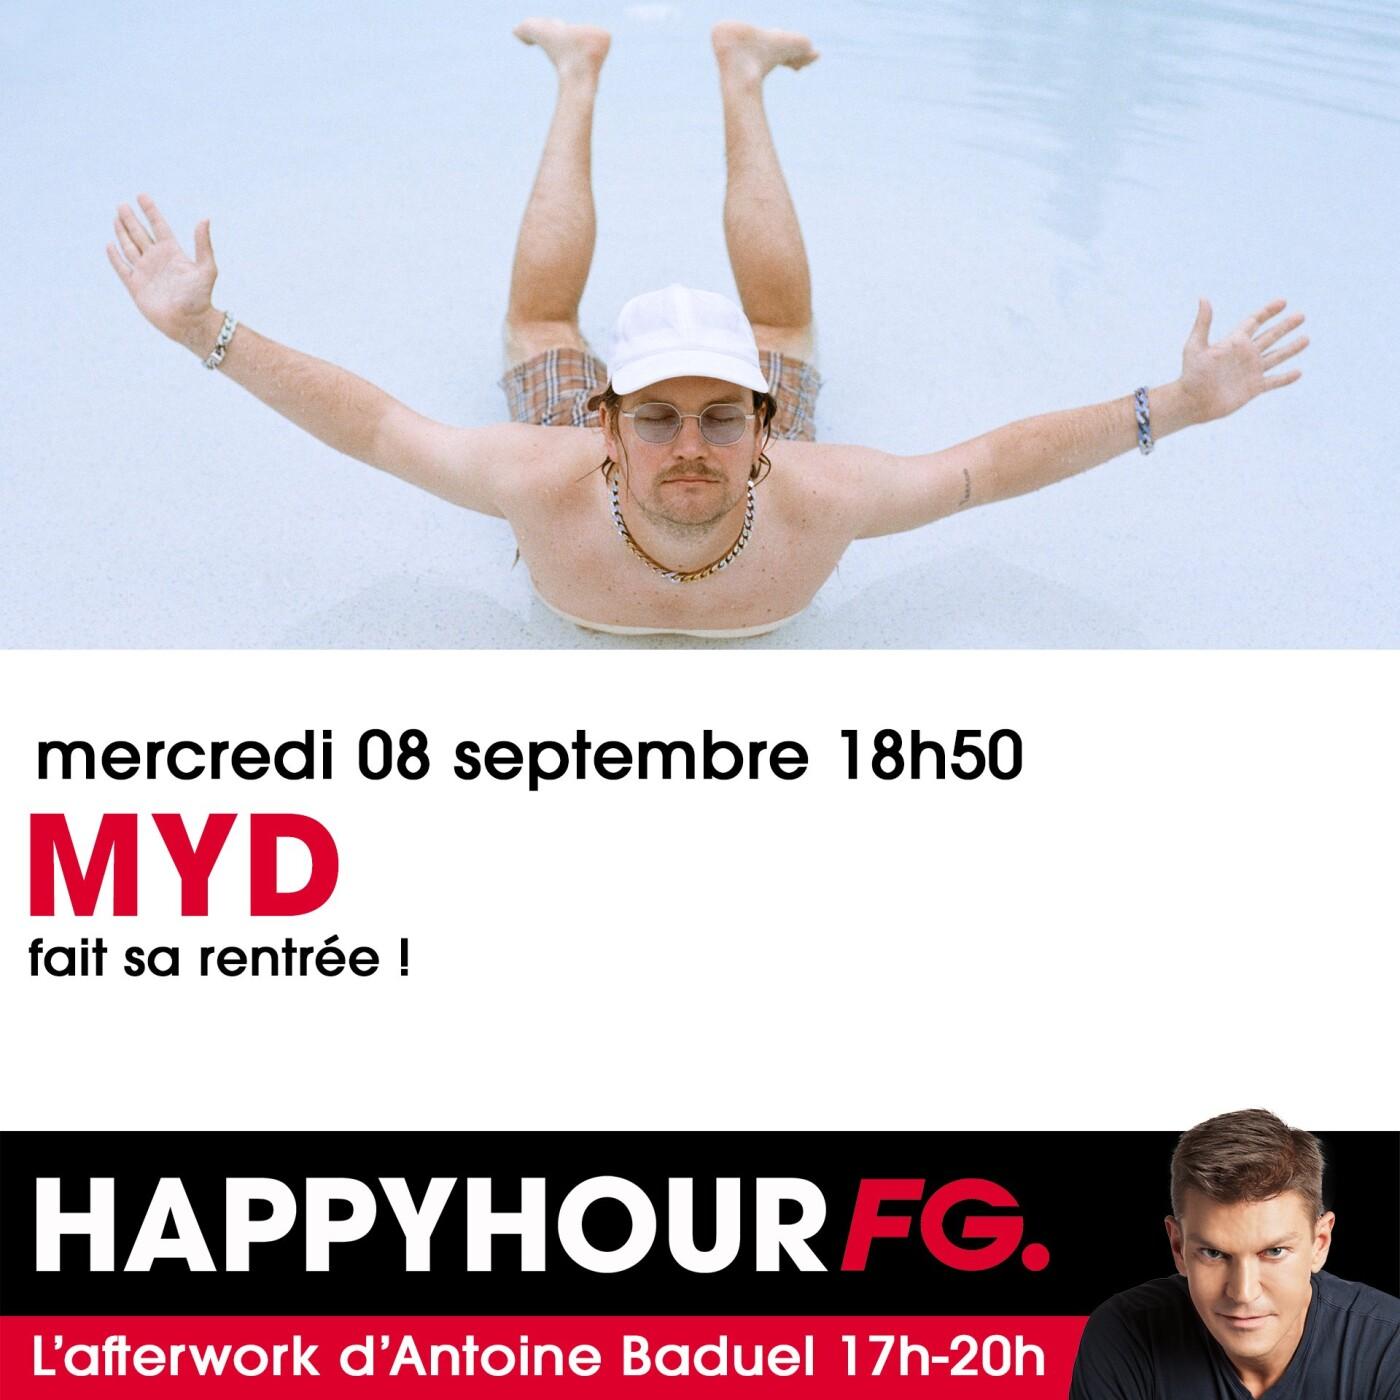 HAPPY HOUR INTERVIEW : MYD